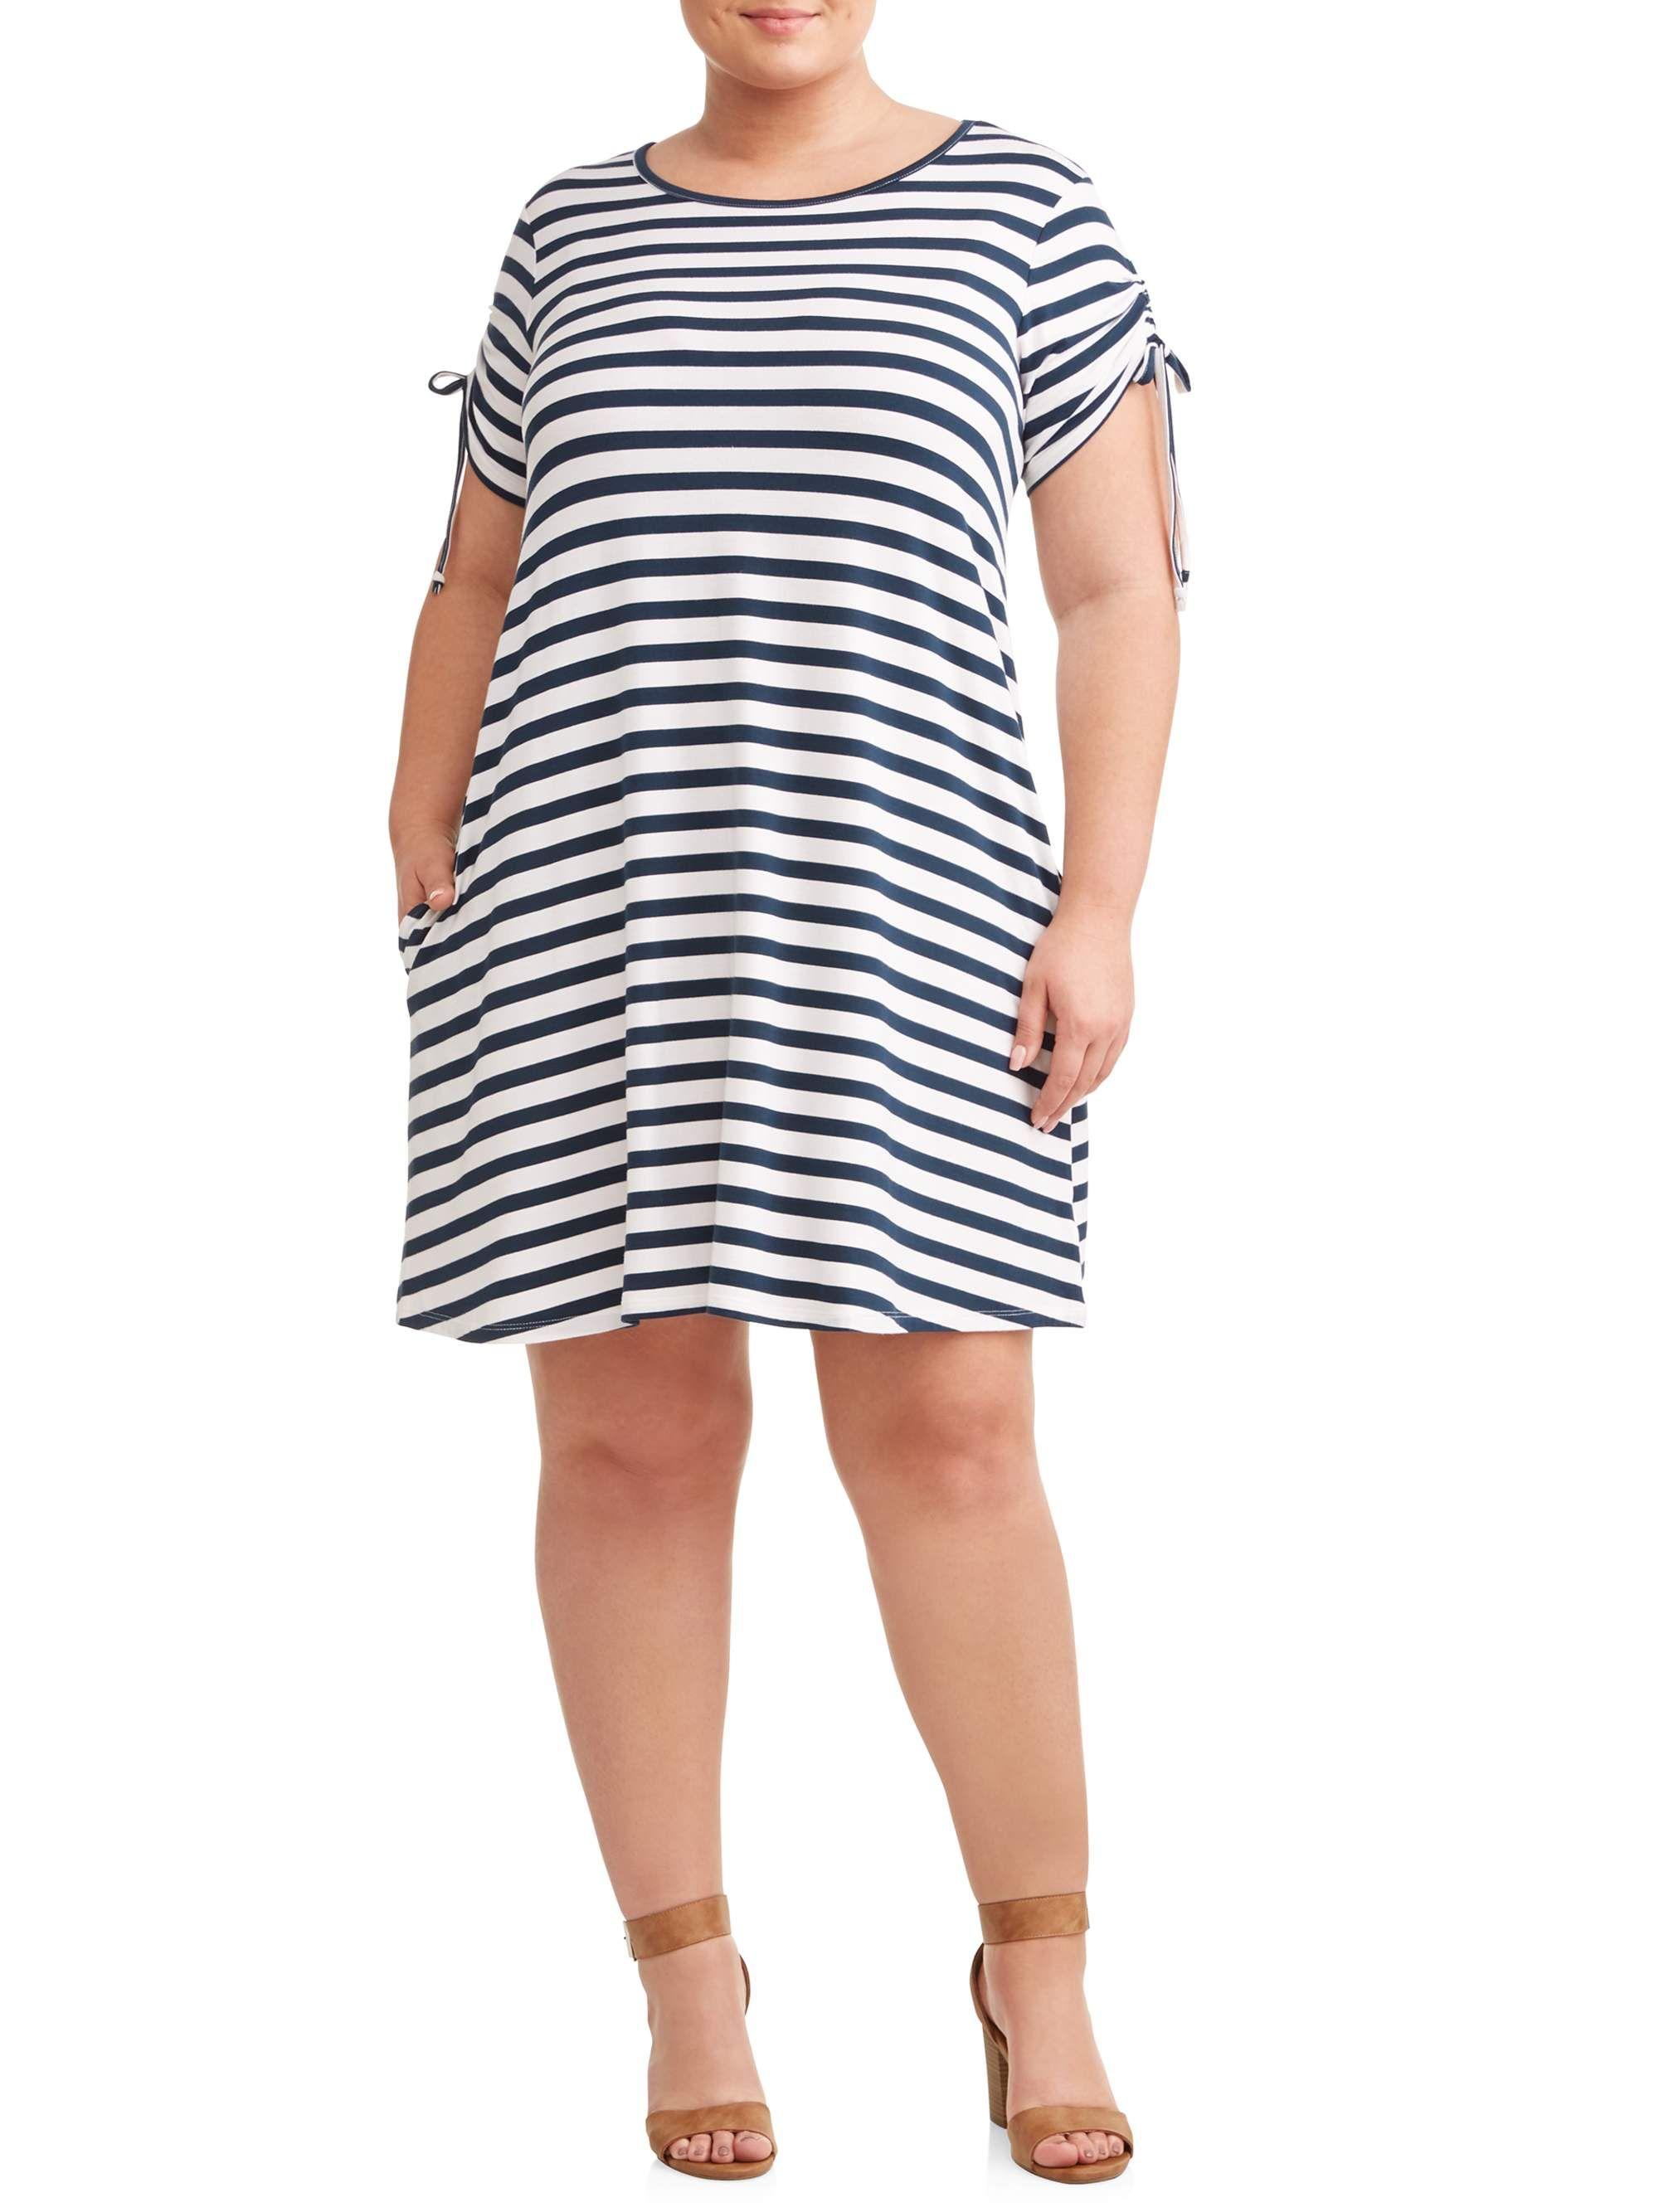 Cottonlinen Striped Casual Dress Striped Casual Dresses Casual Cotton Dress Knee Length Dress [ 1200 x 800 Pixel ]